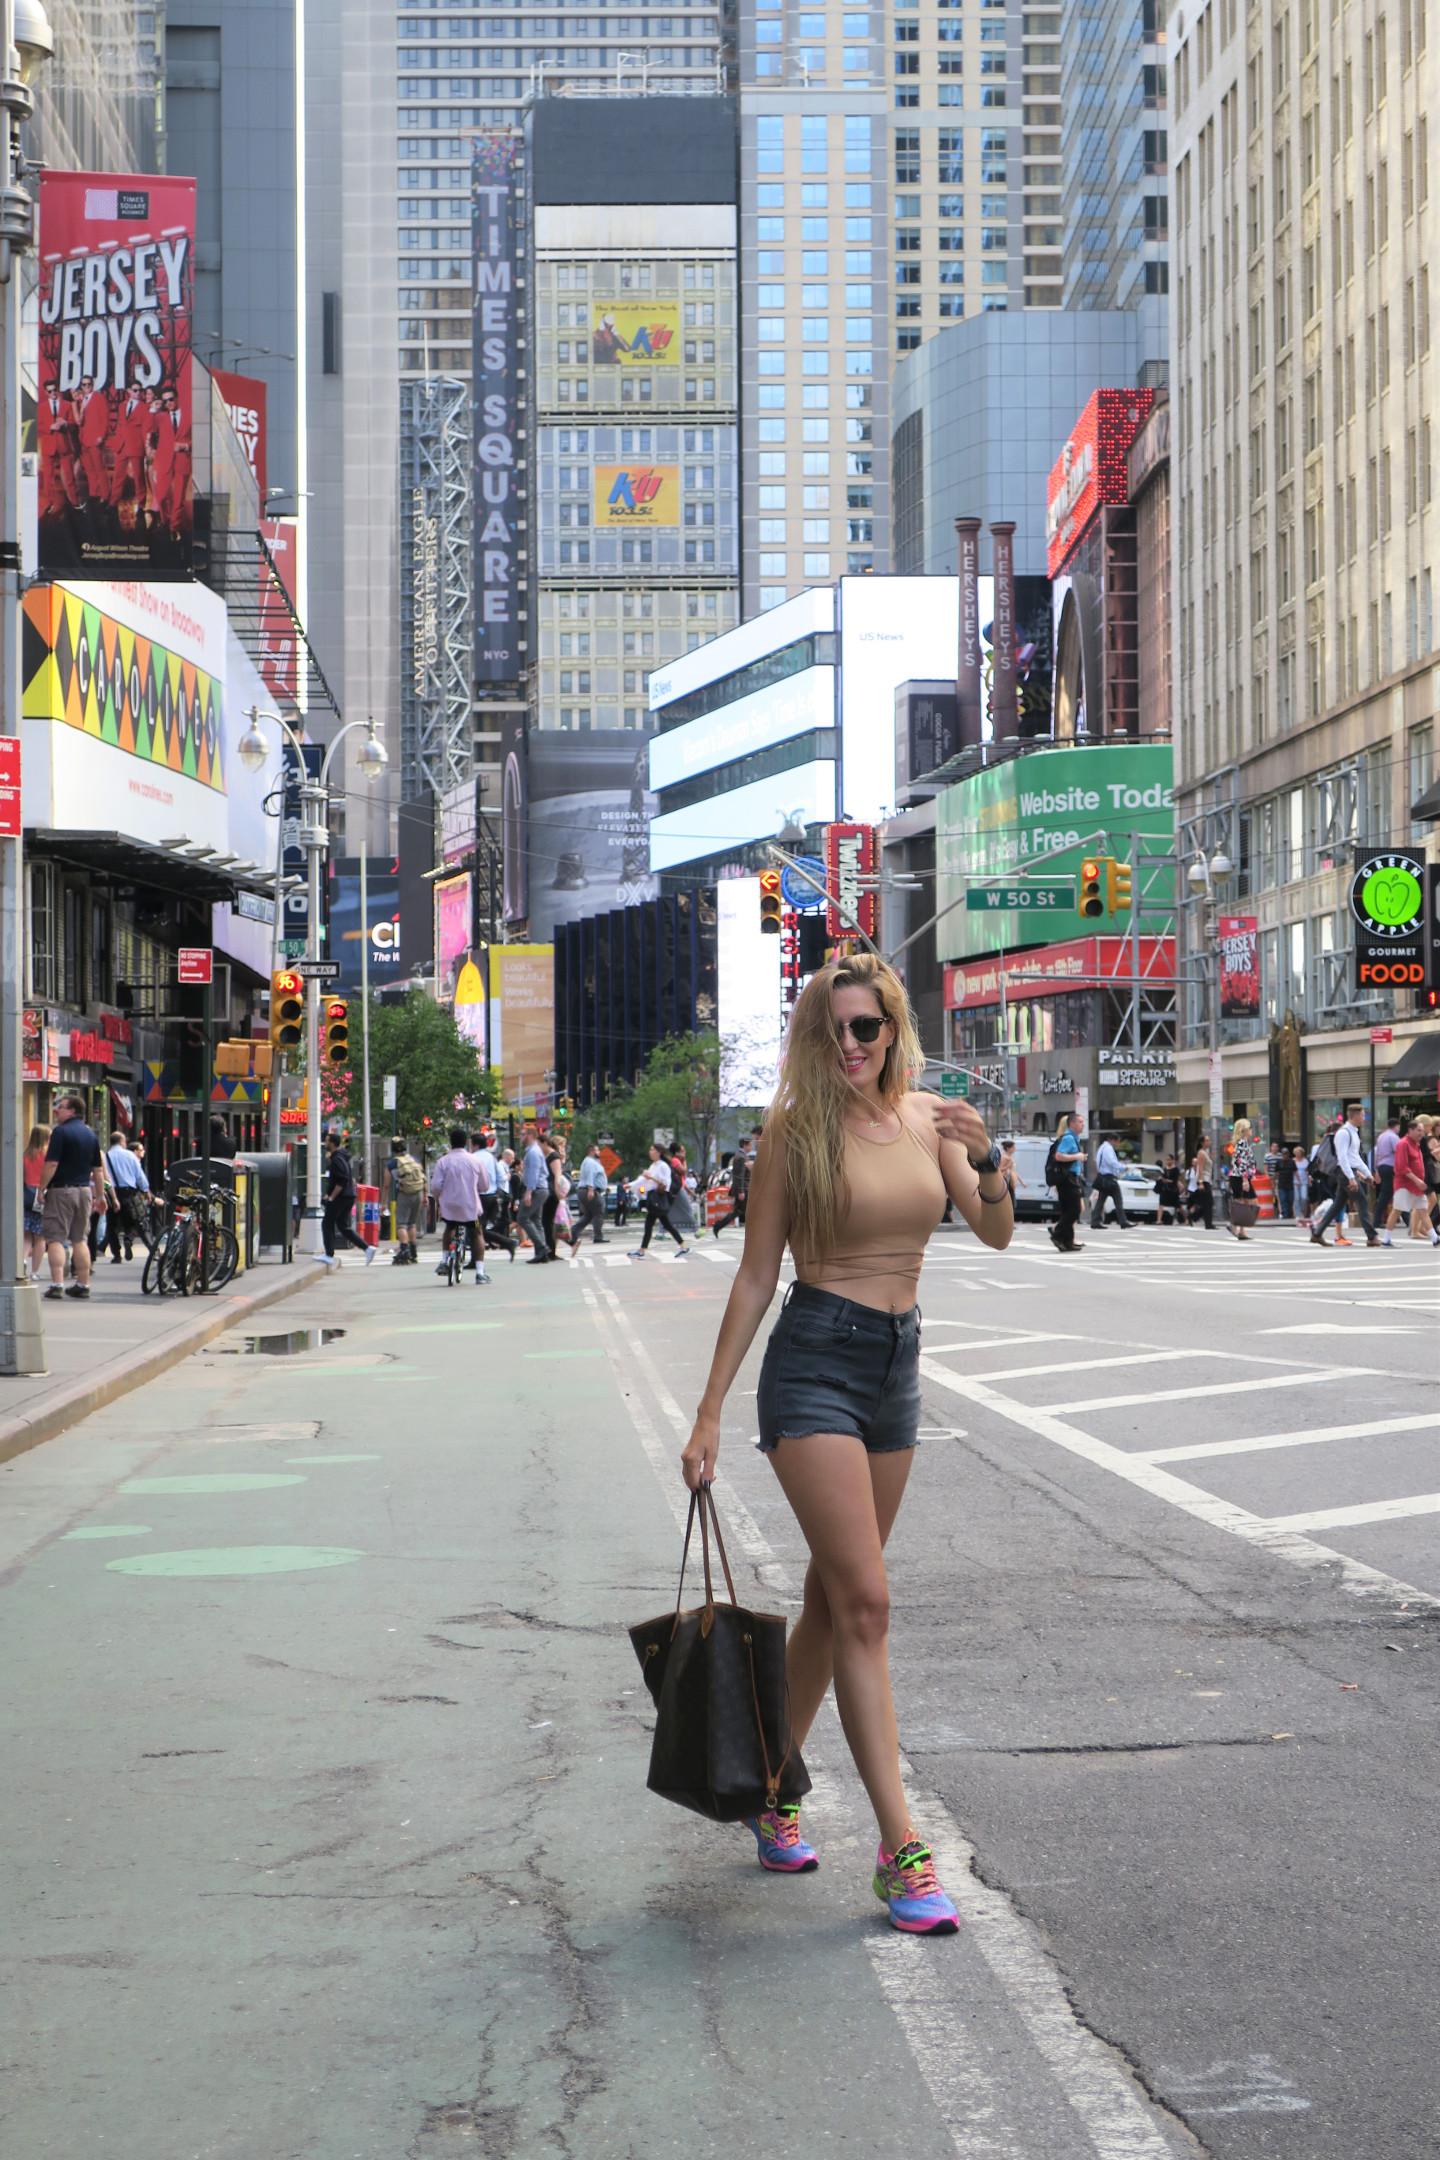 Times_Square_Nueva_York_New_York_Lara_Martin_Gilarranz_Bymyheels (3)